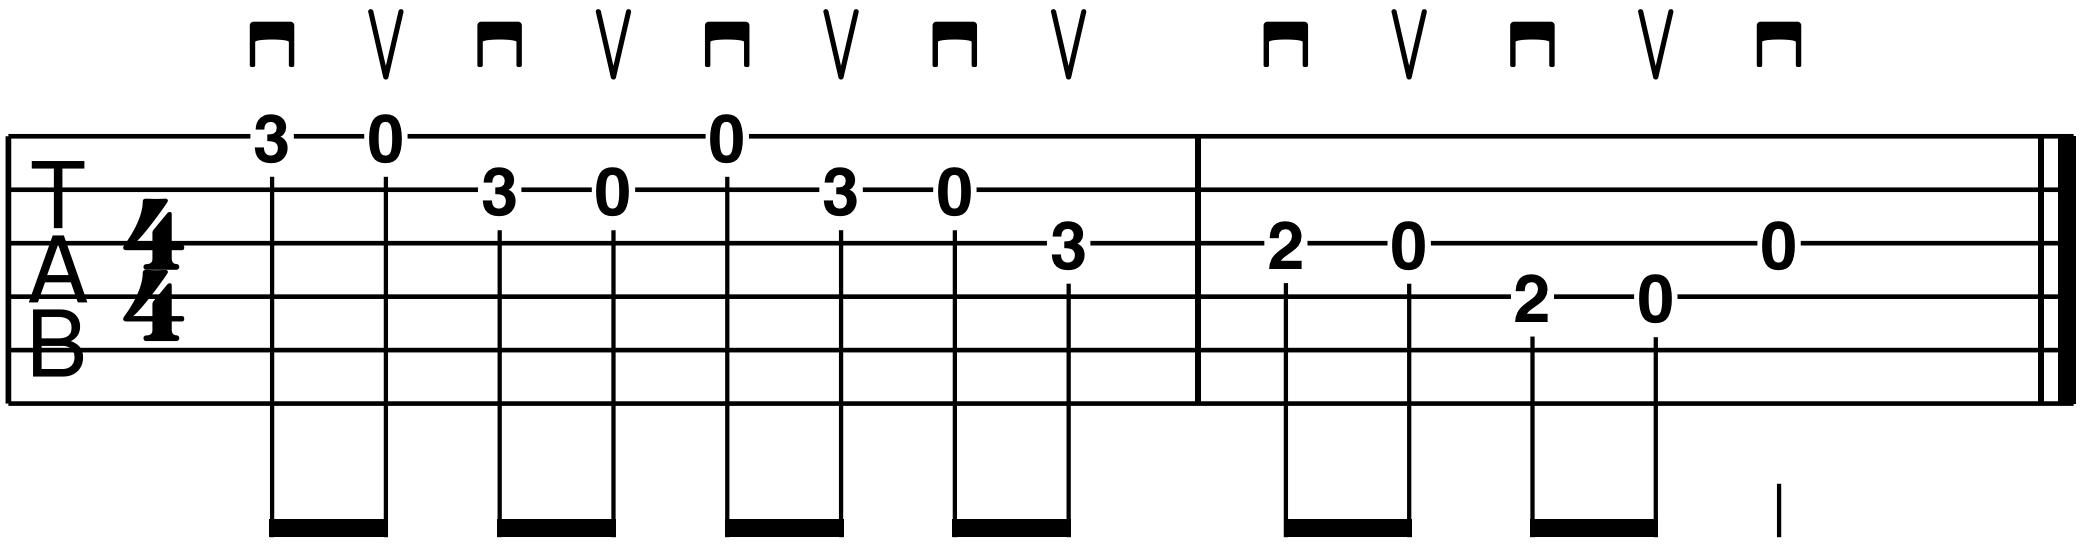 pick stroke direction symbols guitar tablature